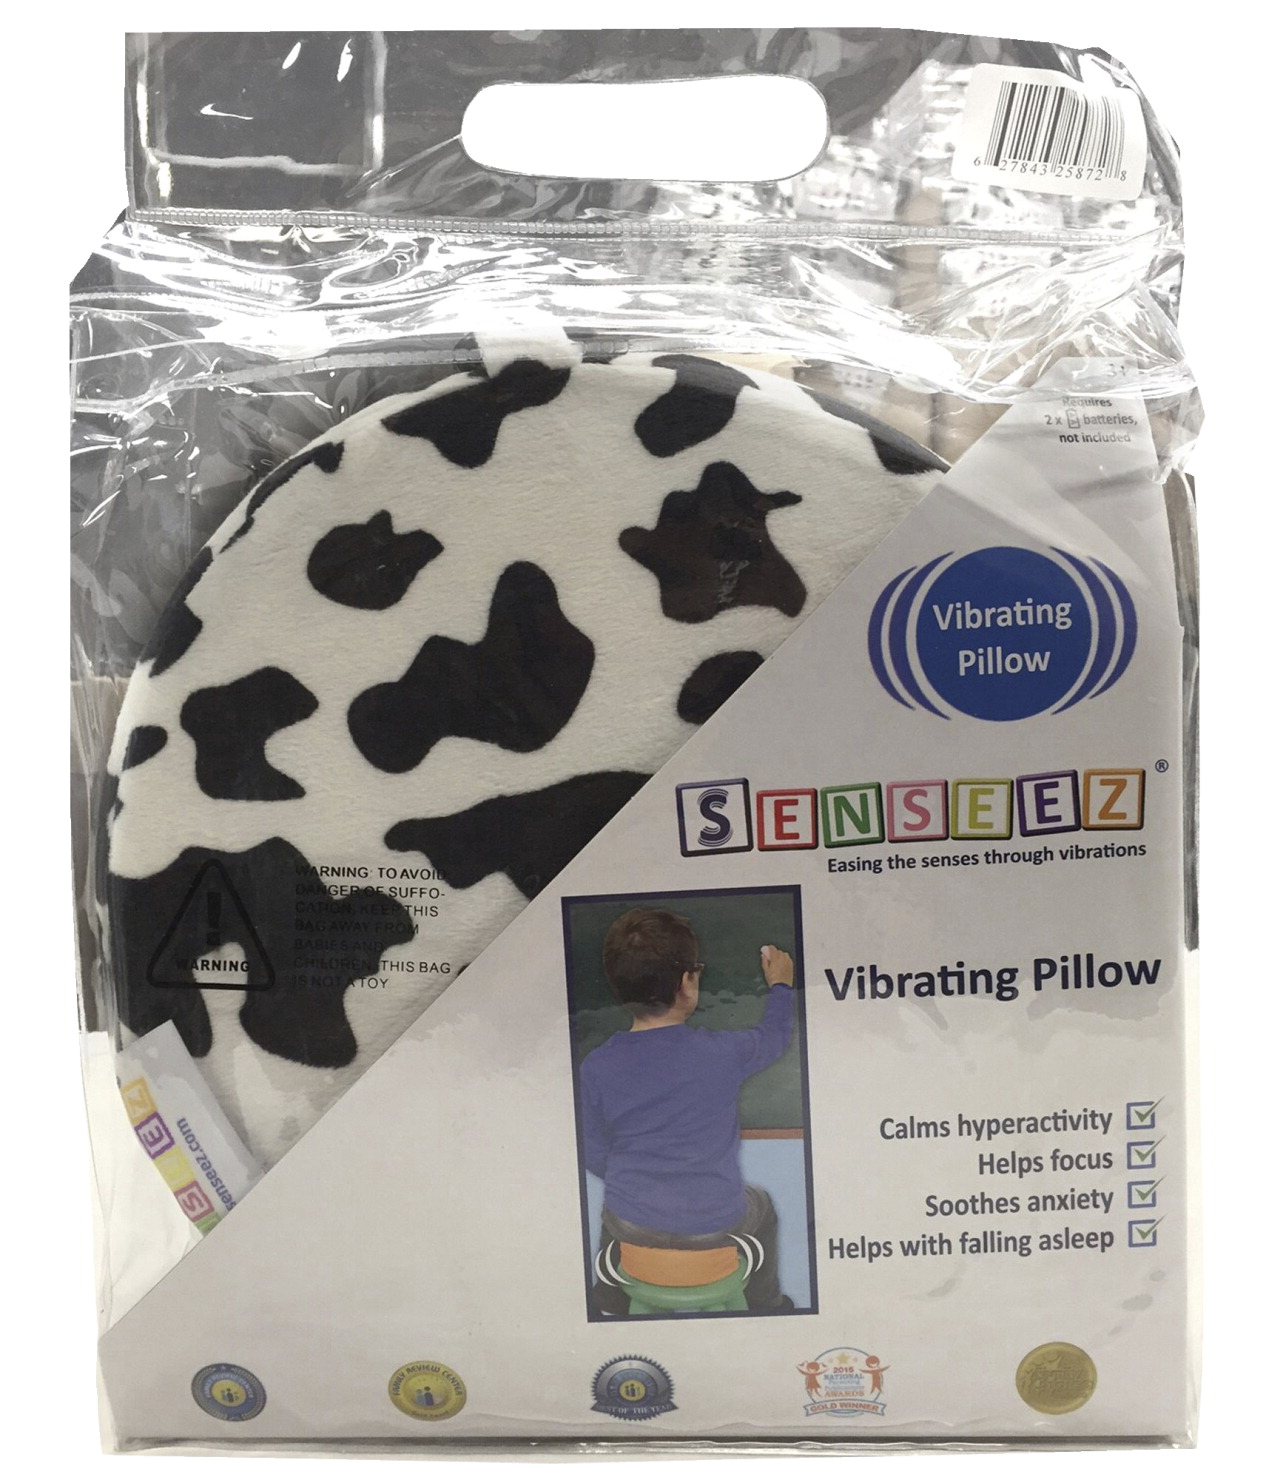 Vibrating Animal Pillow : Senseez Vibrating Pillow, Furry Cow - SCHOOL SPECIALTY MARKETPLACE